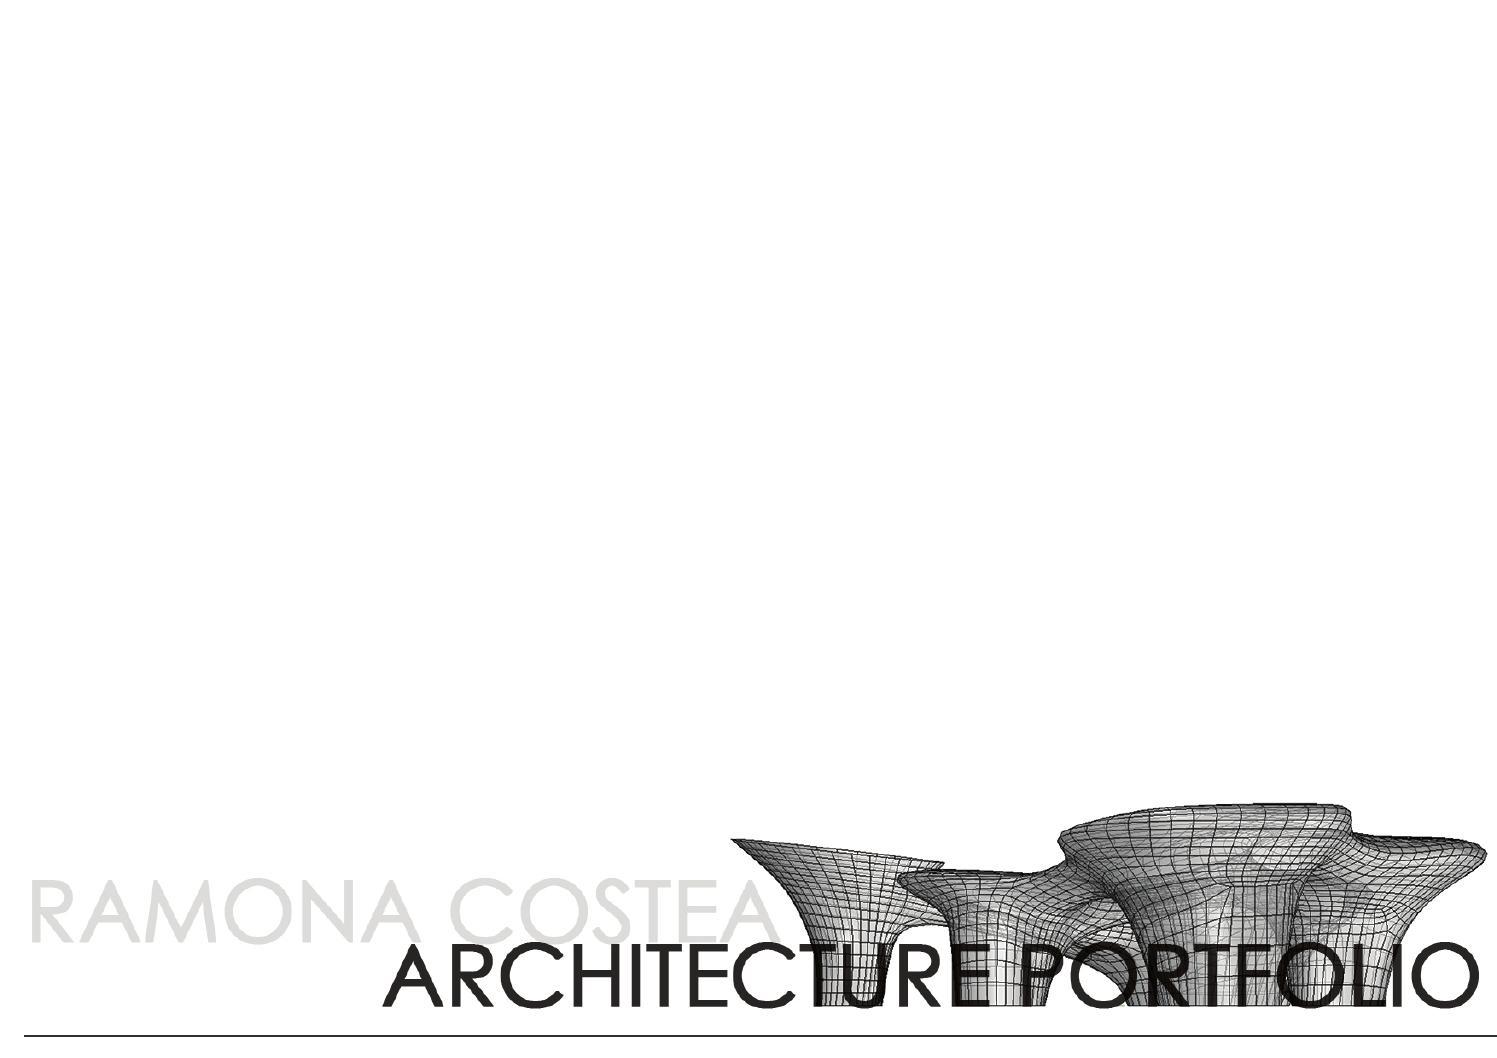 Ramona Costea Architecture Portfolio 2014 By Ramonacostea